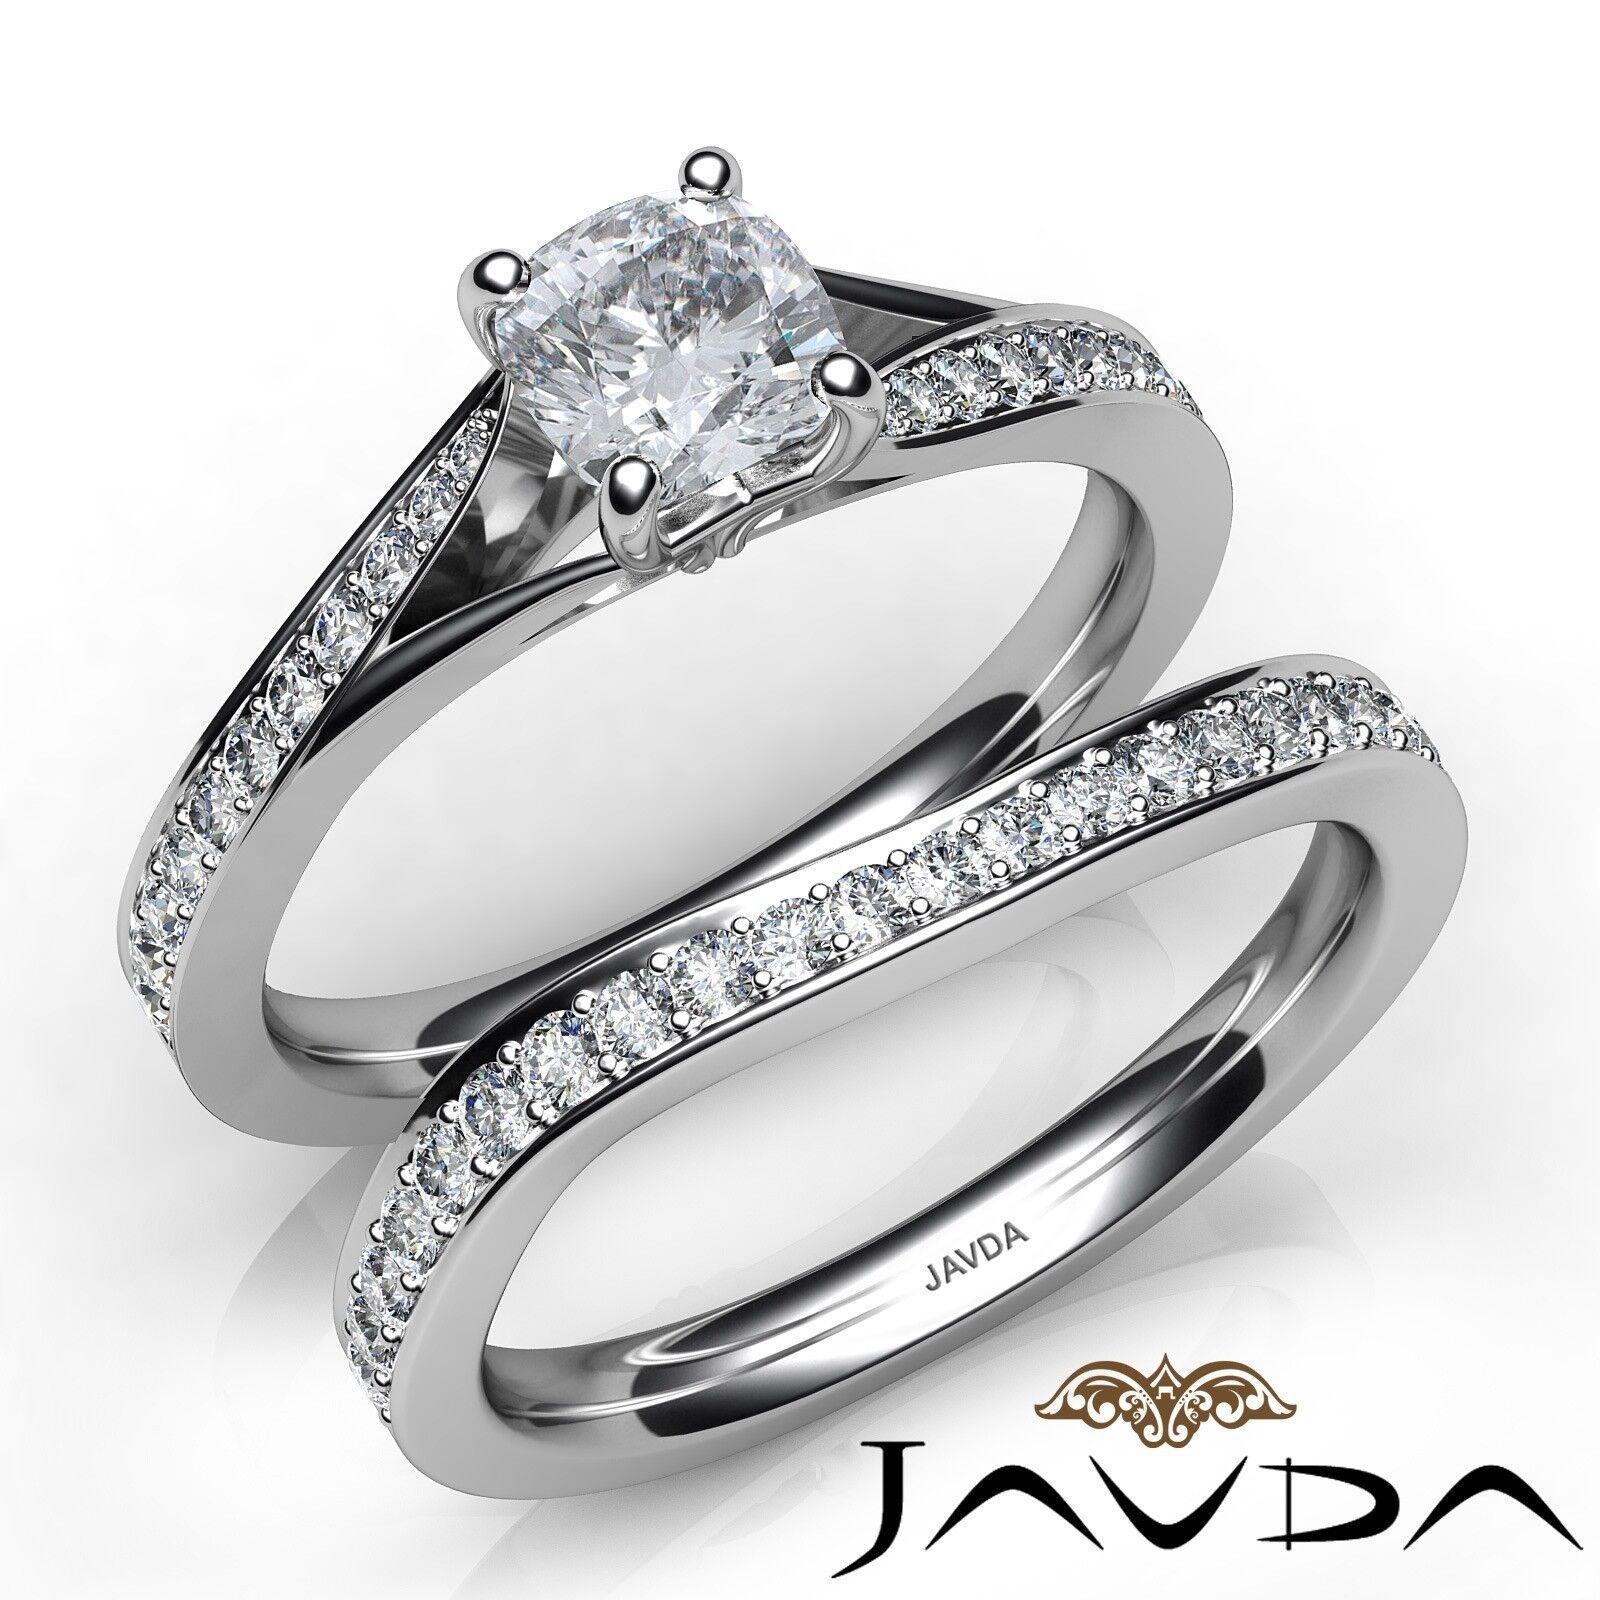 1.66ctw Classic Sidestone Bridal Set Cushion Diamond Engagement Ring GIA H-VS2